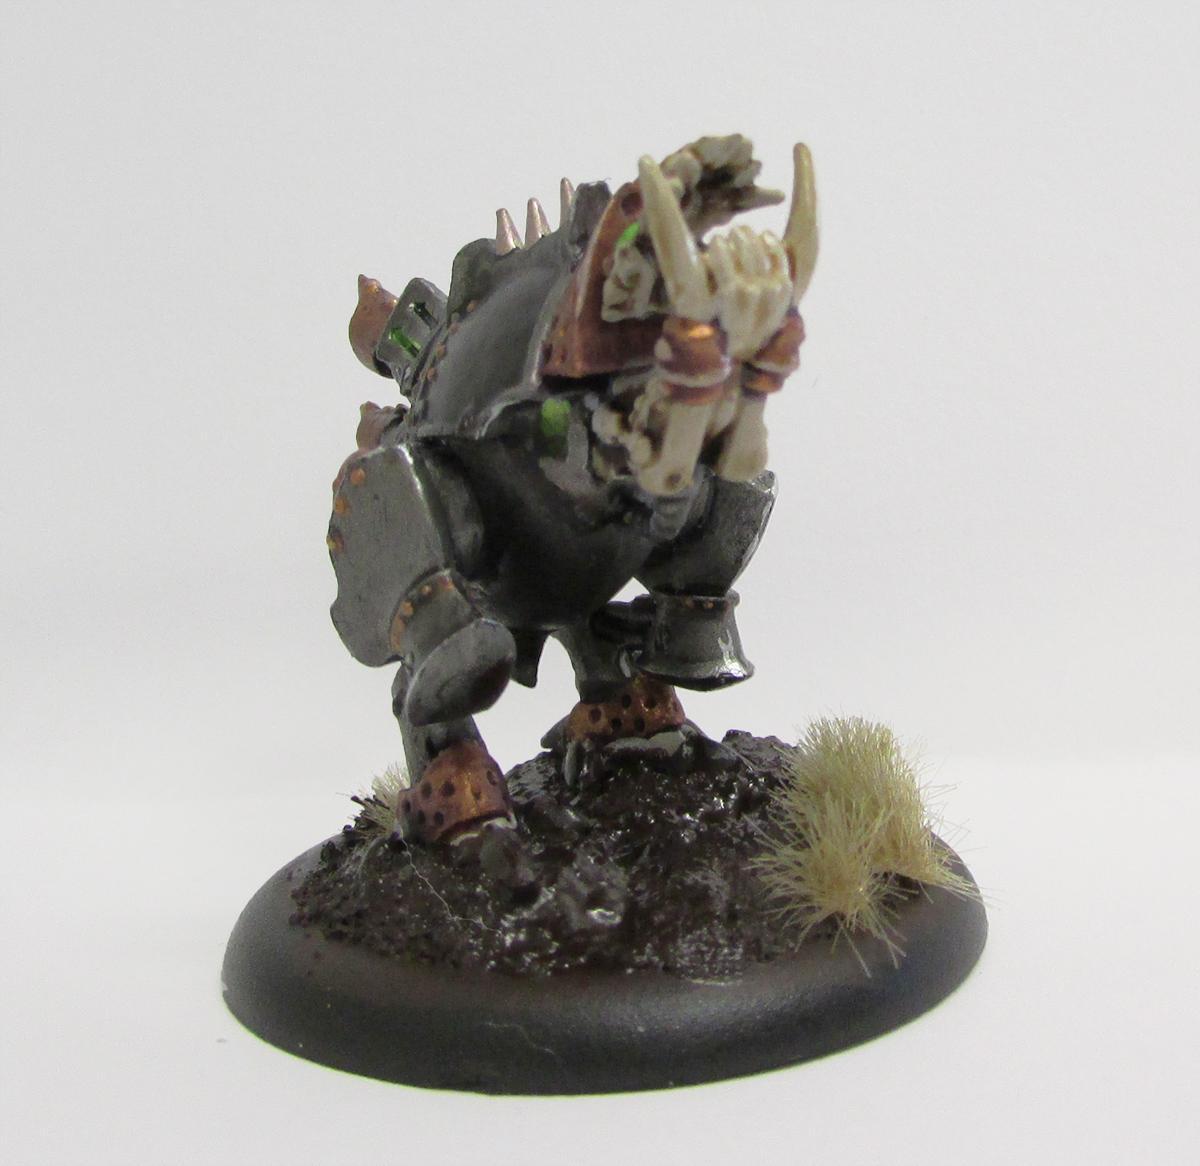 Cryx, Deathripper, Mud Base, Privateer Press, Warjack, Warmachine